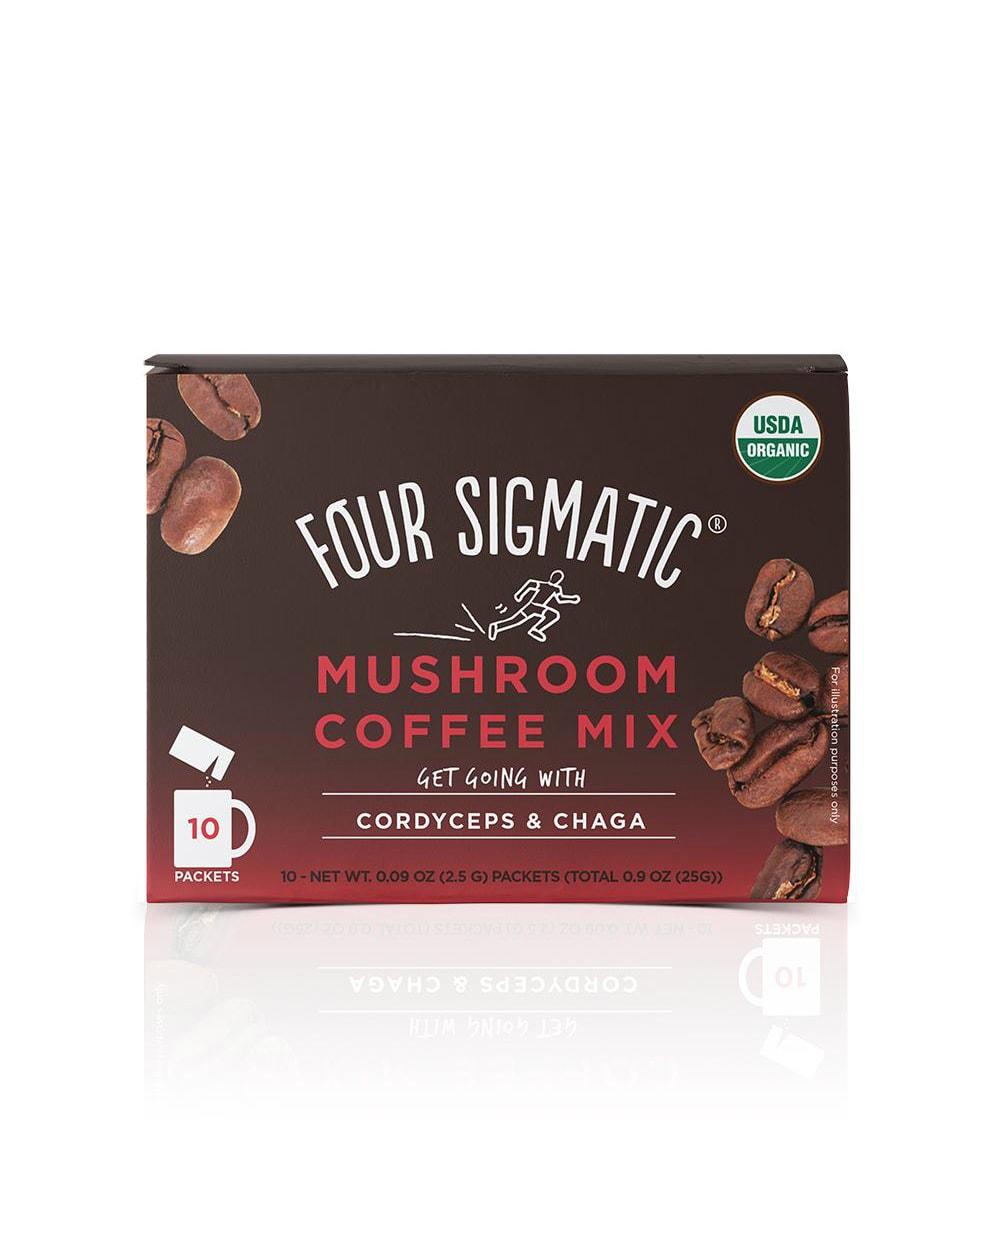 four_sigmatic_mushroom_mix_with_cordyceps_and_chaga